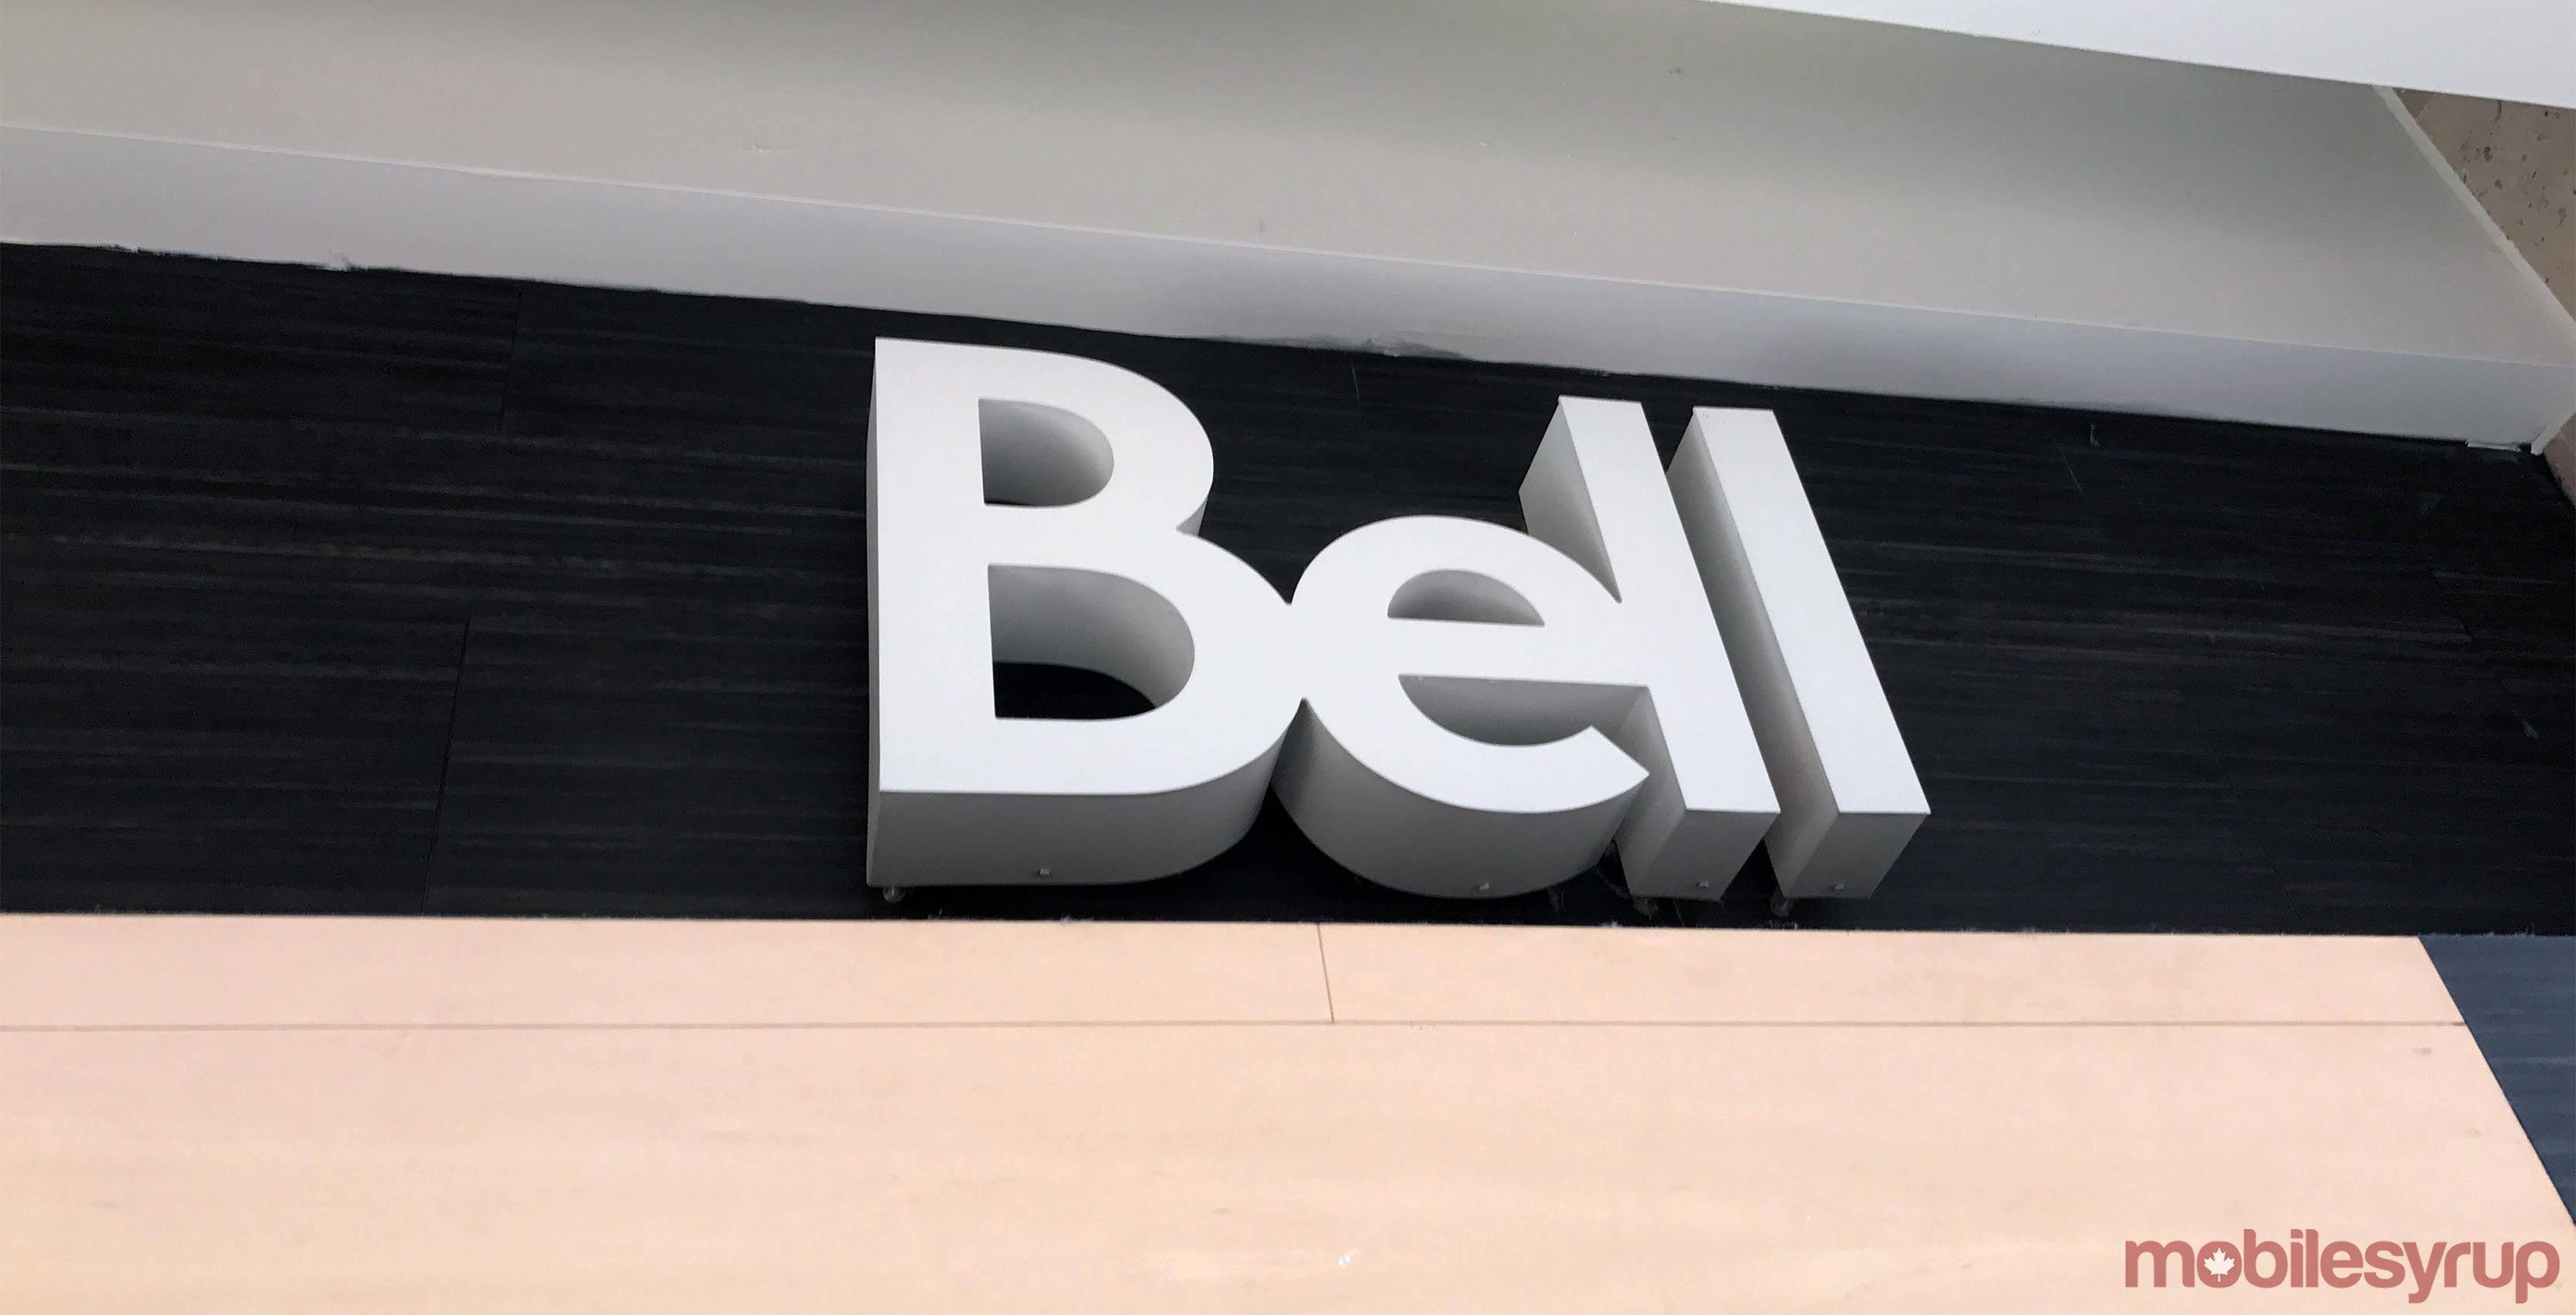 Bell logo on sign